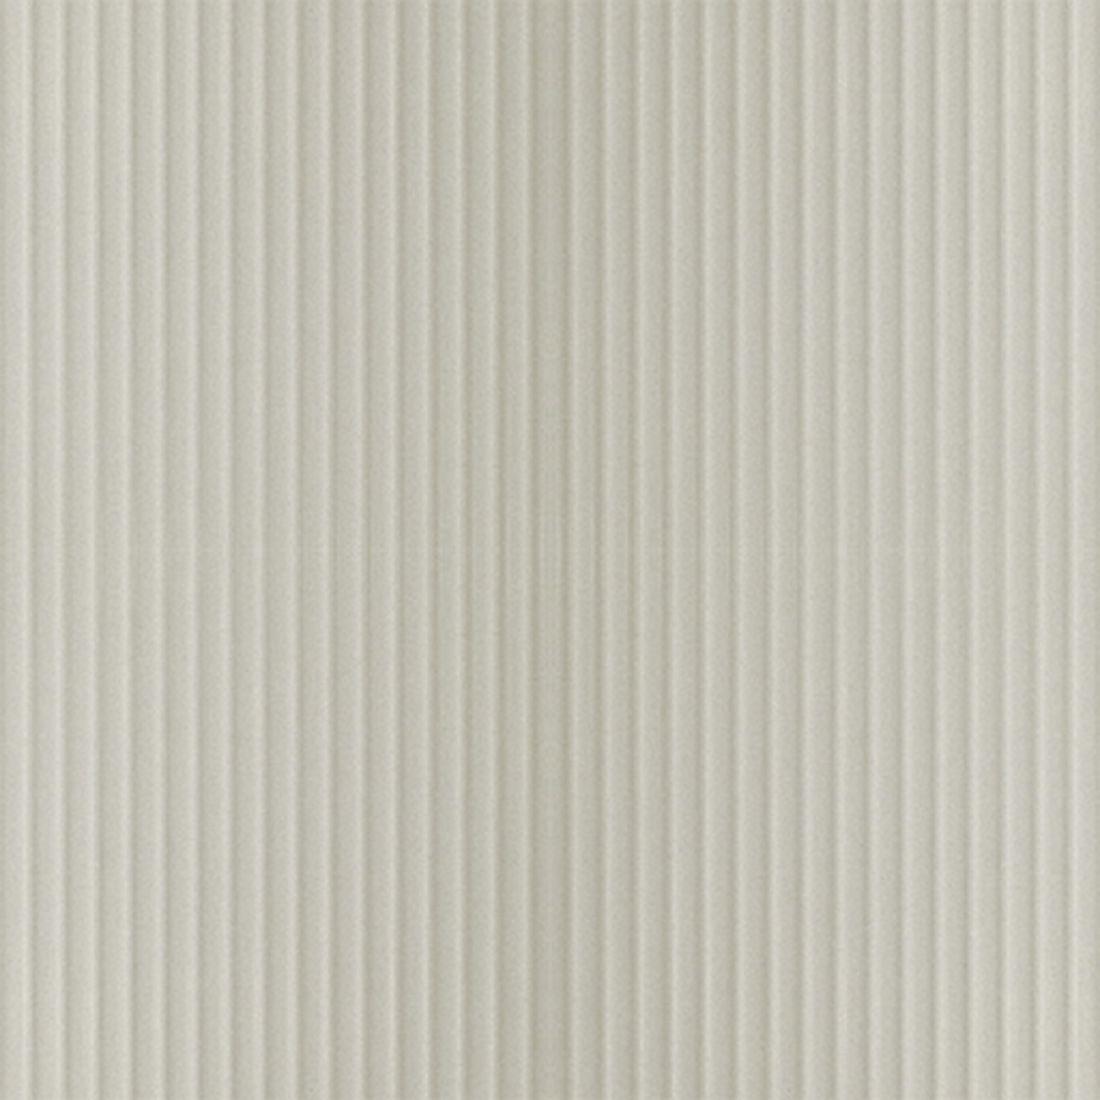 Aqua Wall Lining Panel Stellar Illumina Ripple 2400 x 1200 x 2.7mm